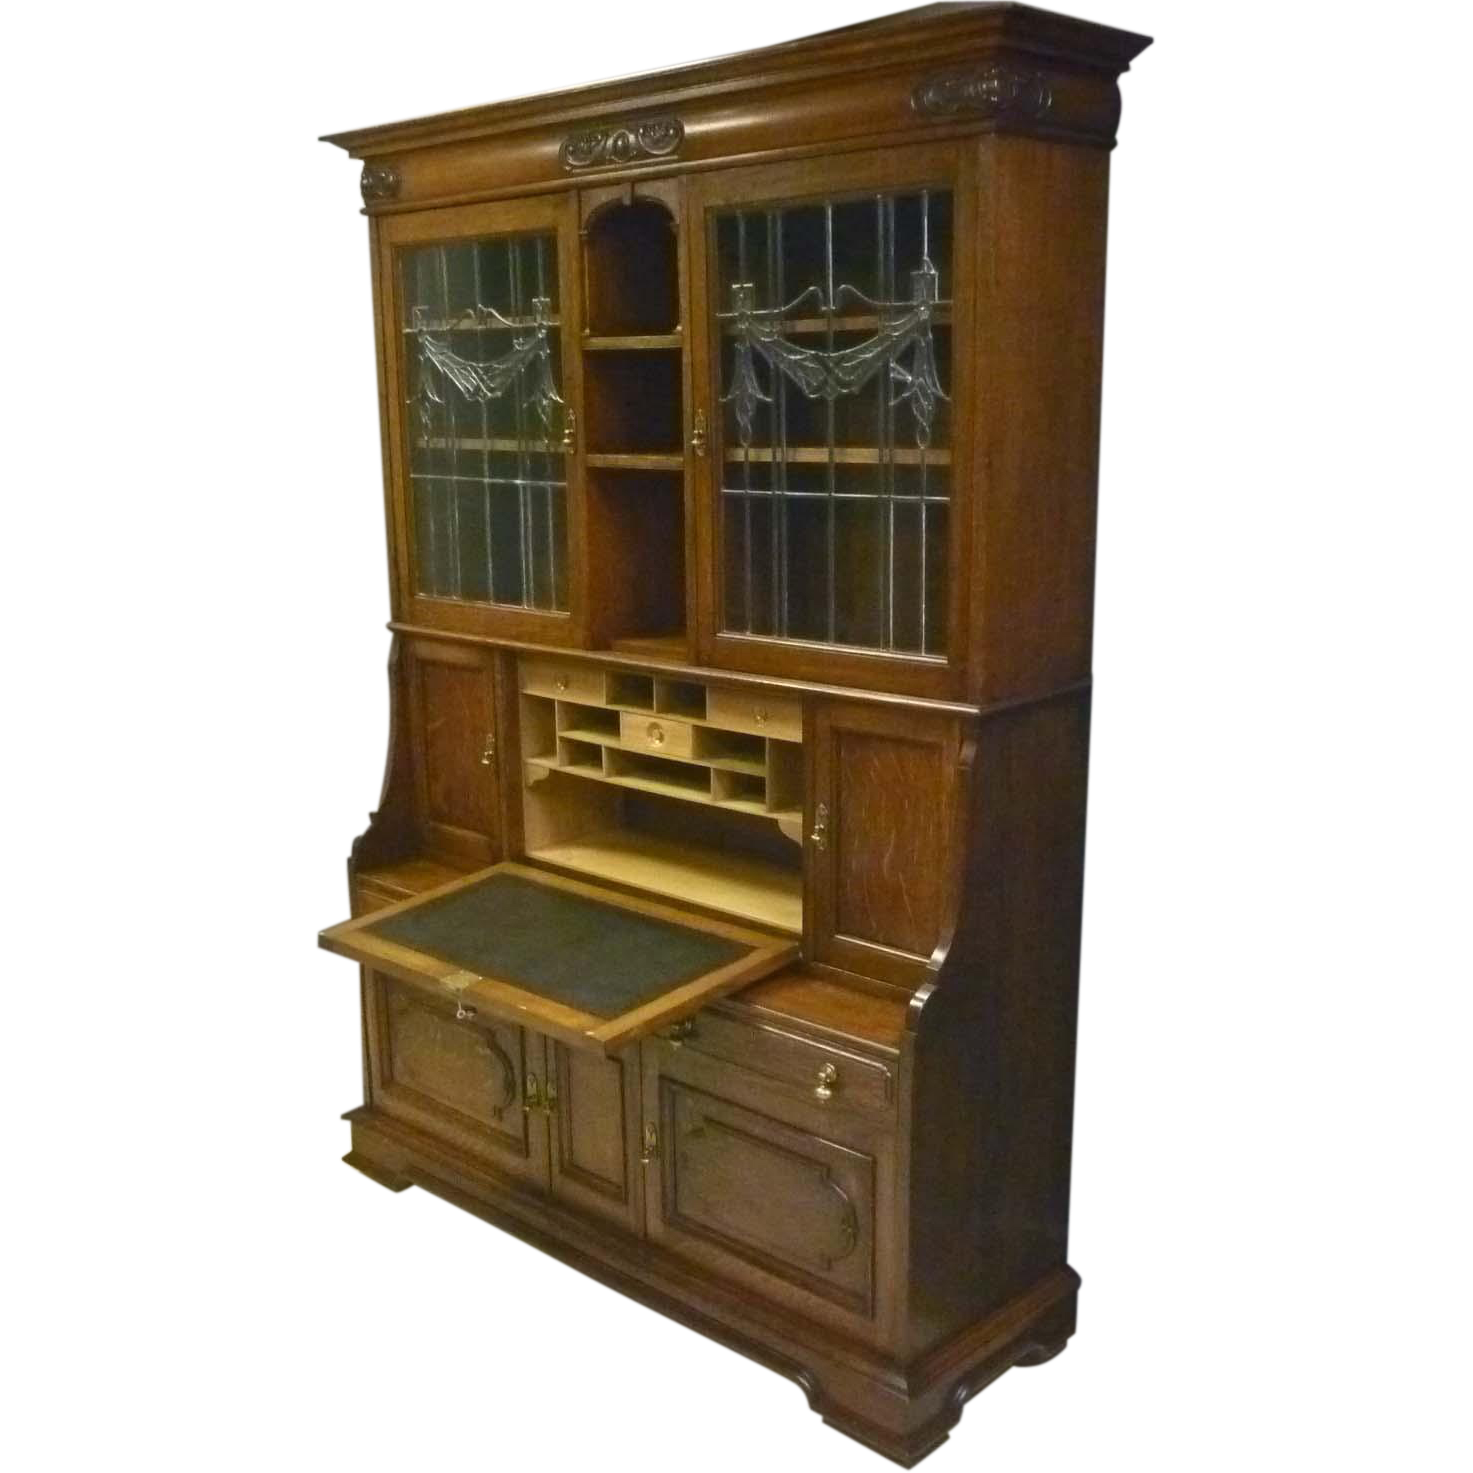 Oak Secretary, Bookcase with Leaded Glass